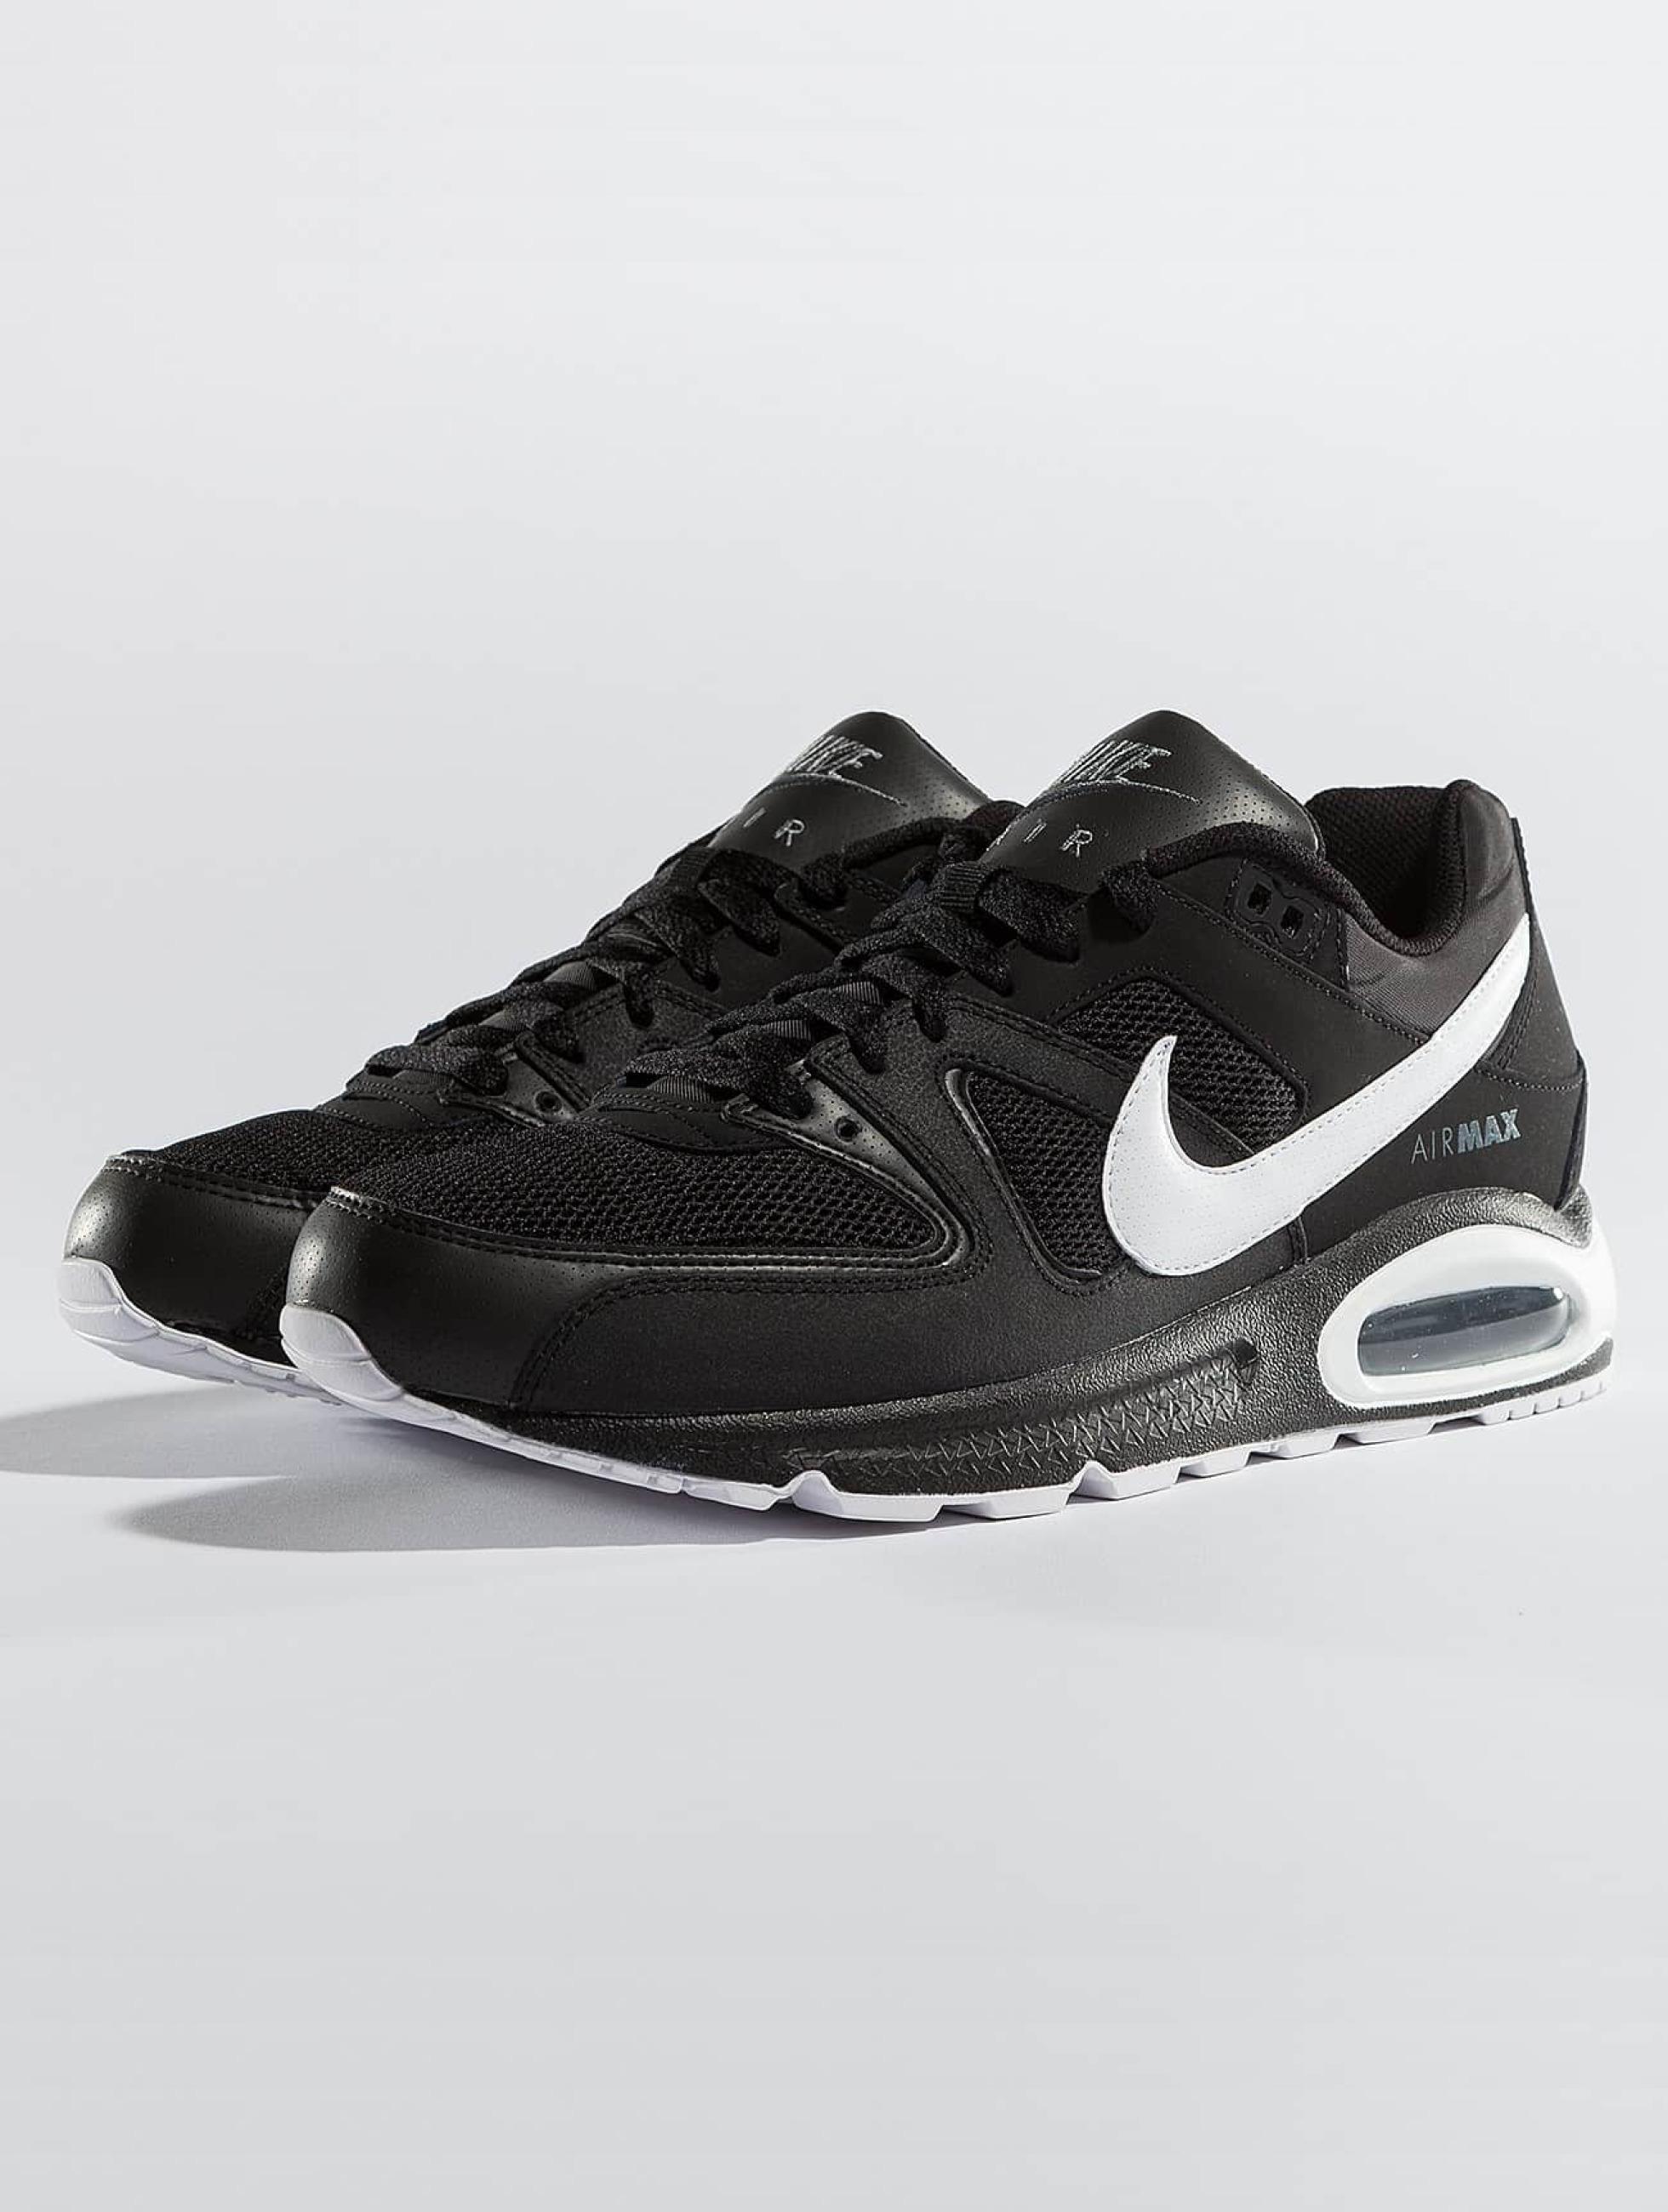 Max Chaussures Command Homme NikeAir 306722 Noir De Fitness LAR4j35